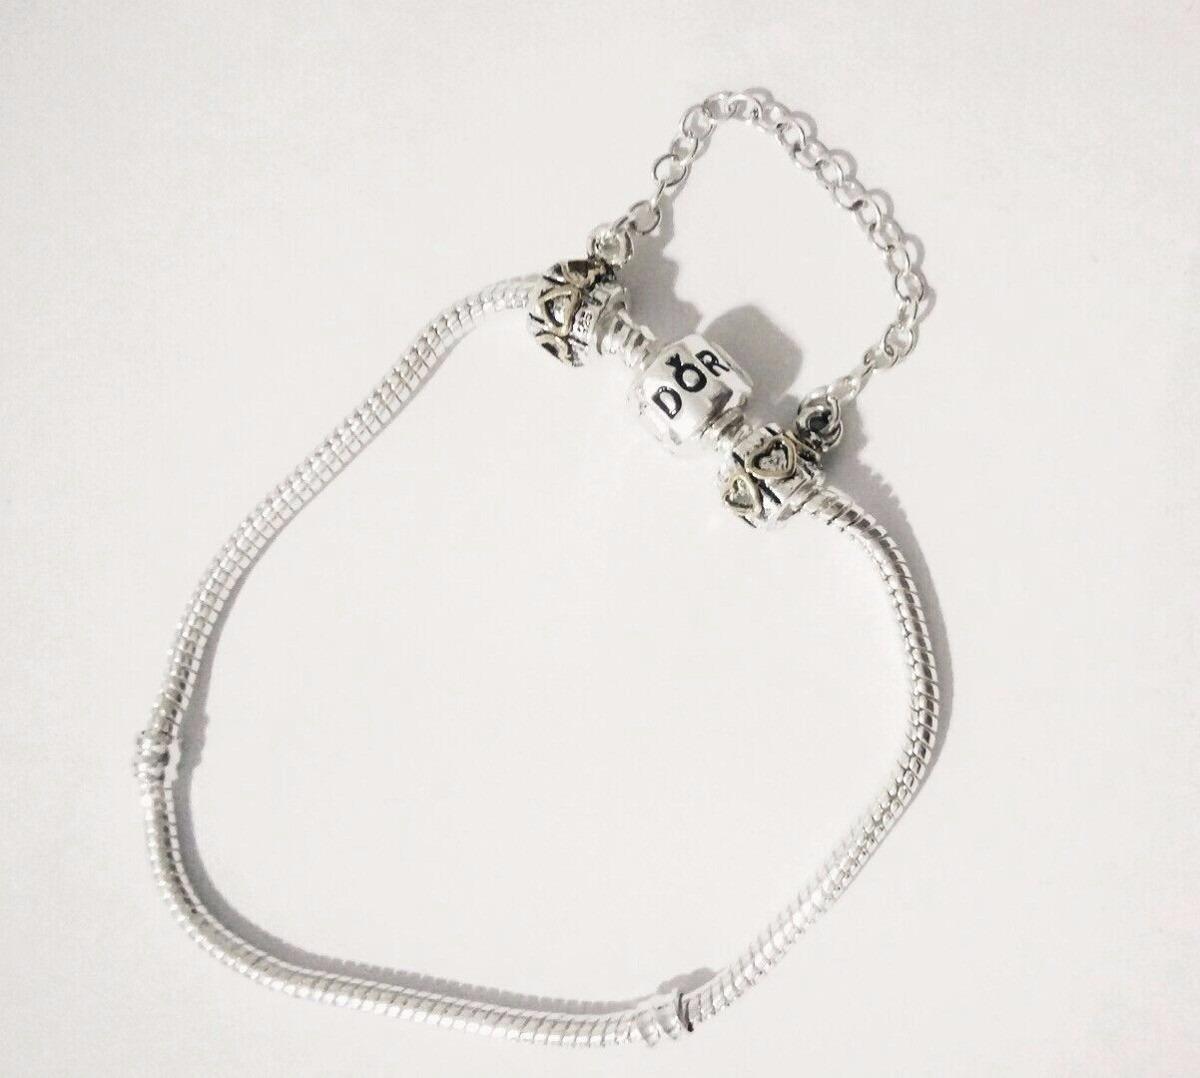 2f44504190b Pulseira Bracelete Pandora + Trava + 1 Berloques - R  25